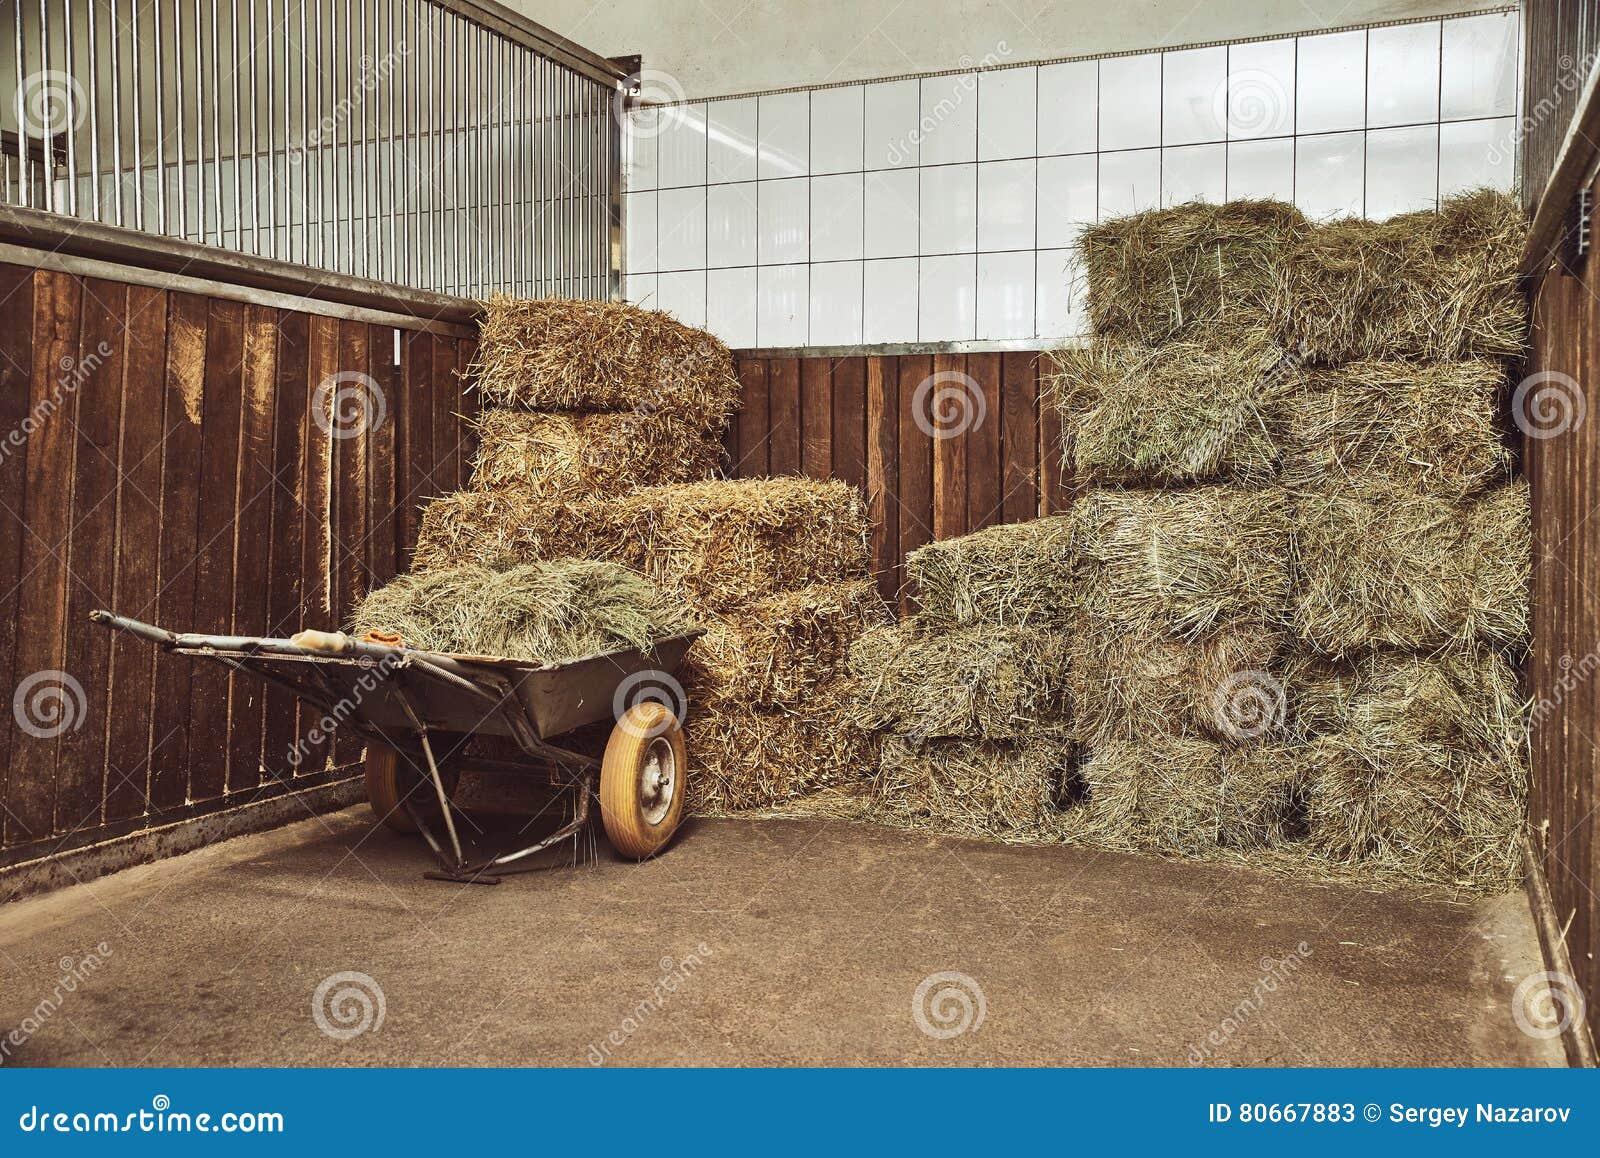 Dry Hay Stacks In Rural Wooden Barn Interior Stock Image ...